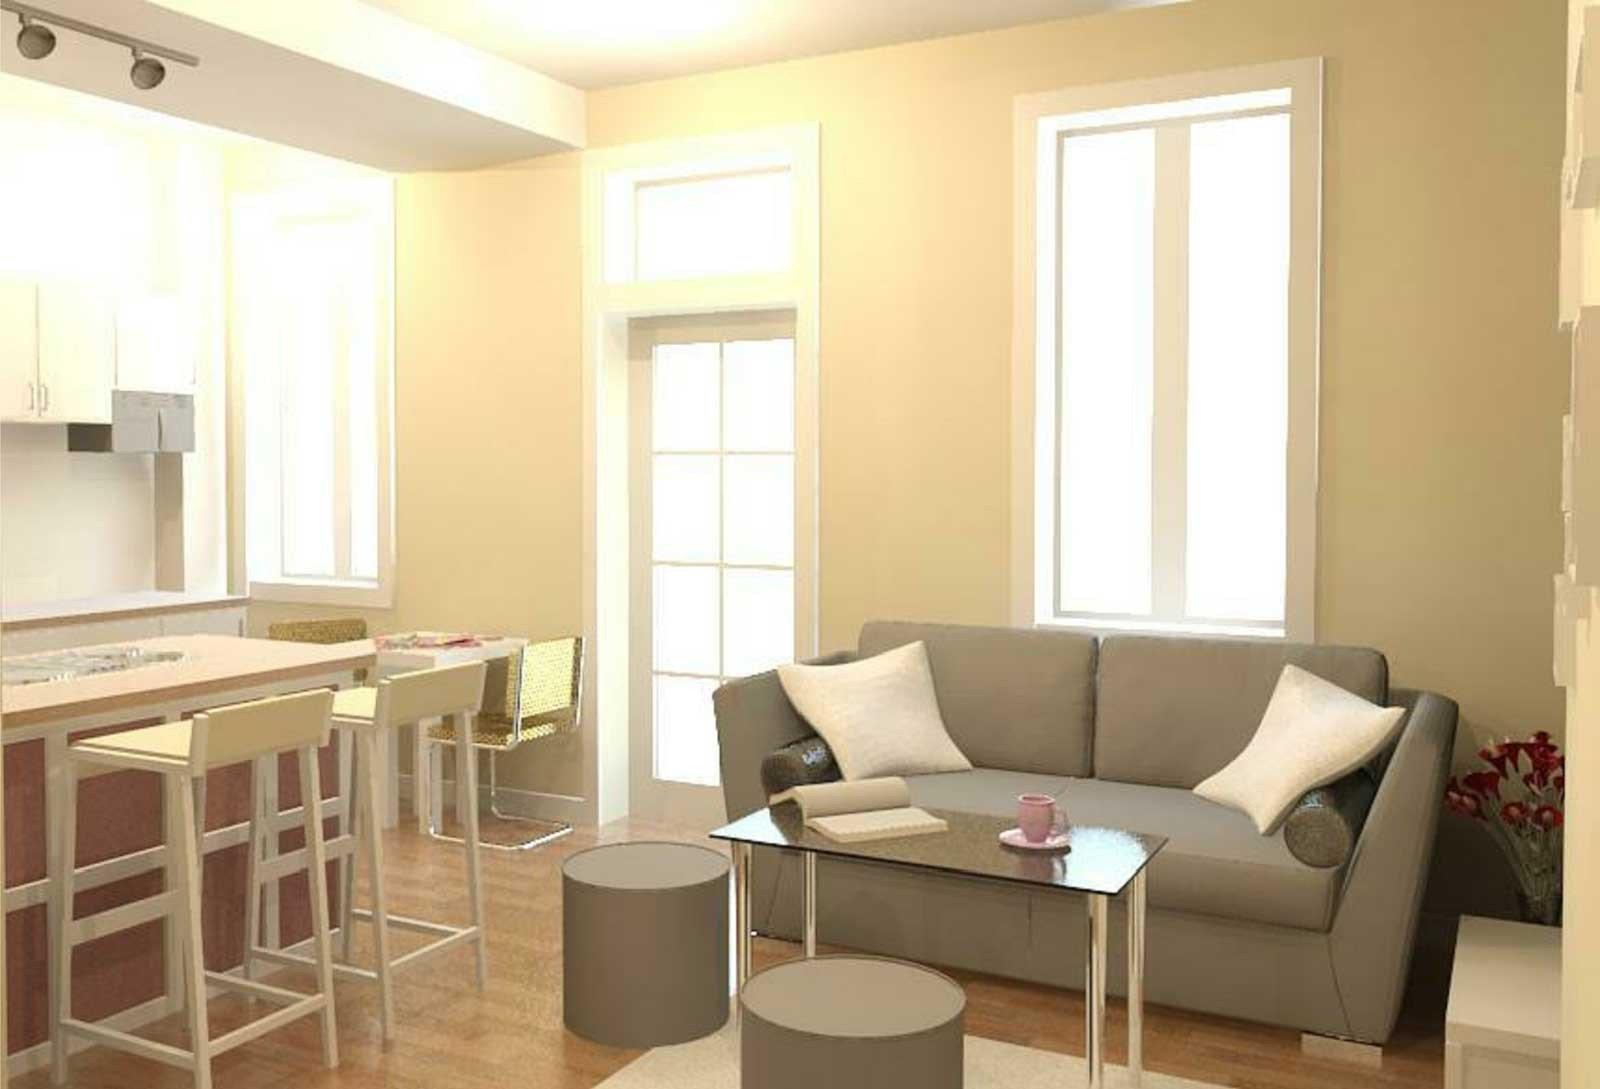 Comfortable Living Room Minimalist Luxury Modern Interior Design for Modern Minimalist Home Amaza Design